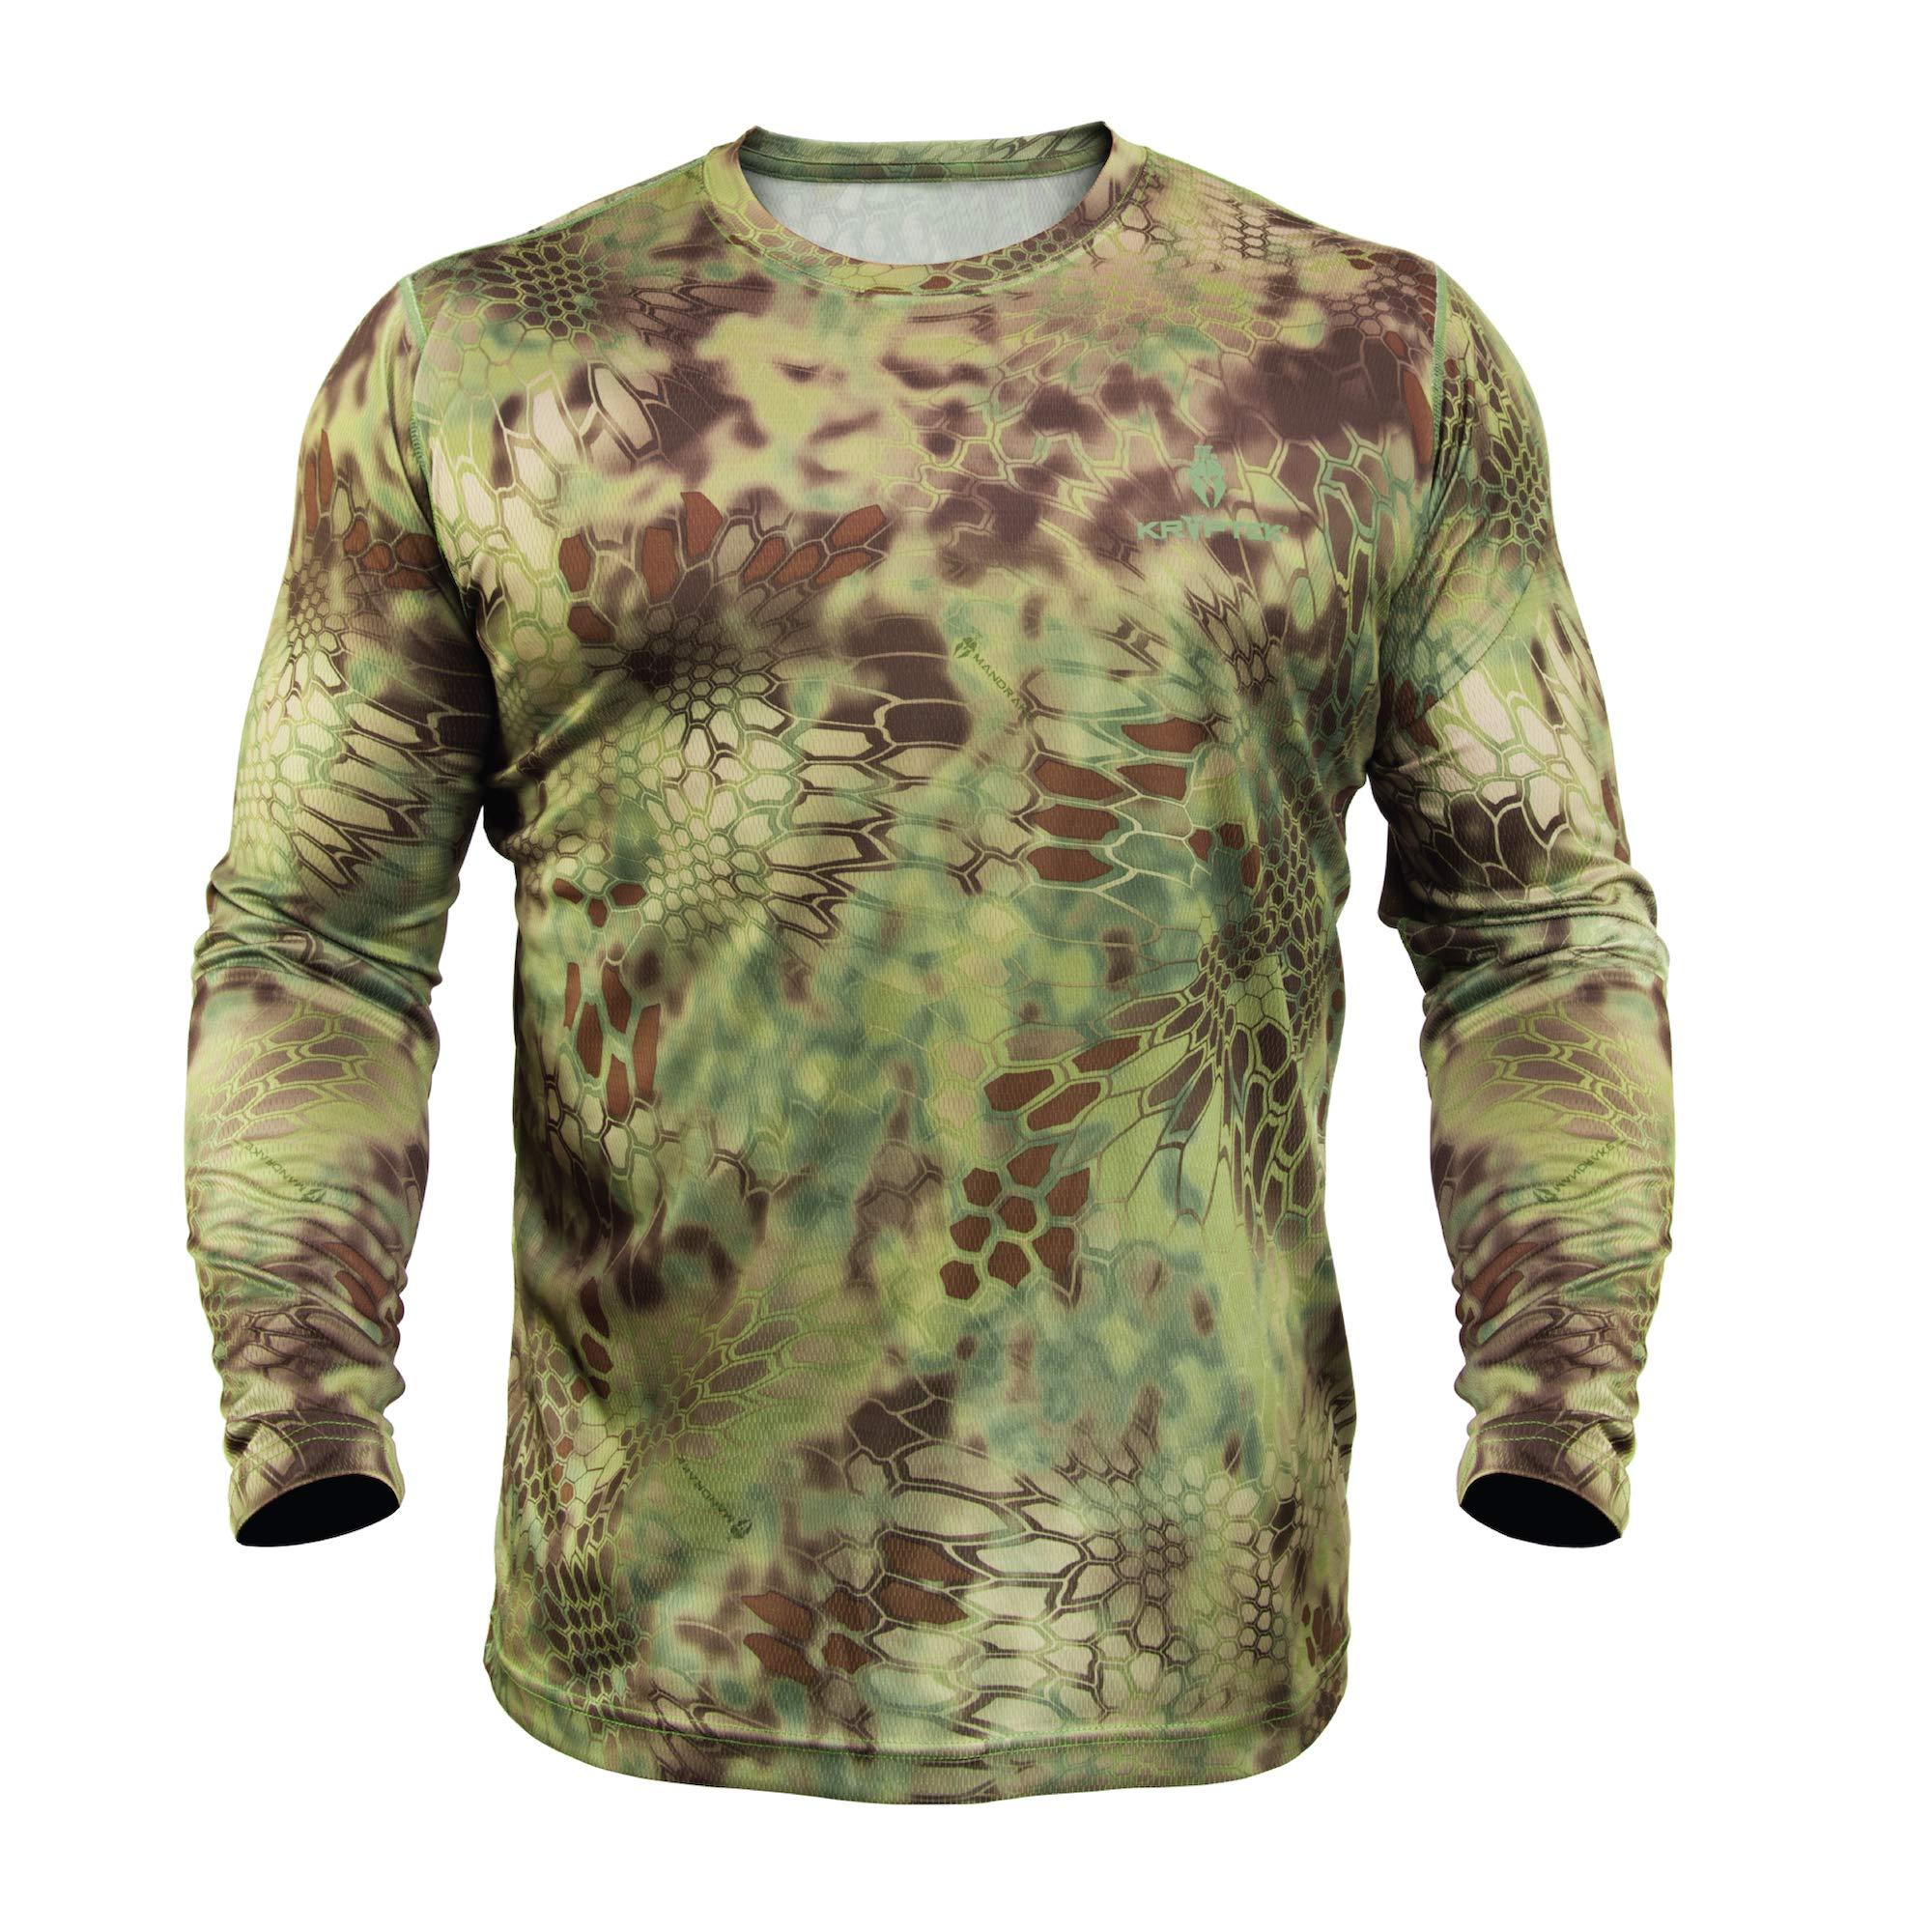 Kryptek Hyperion LS Crew - Long Sleeve Camo Hunting & Fishing Shirt (K-Ore Collection), Mandrake, 3XL by Kryptek